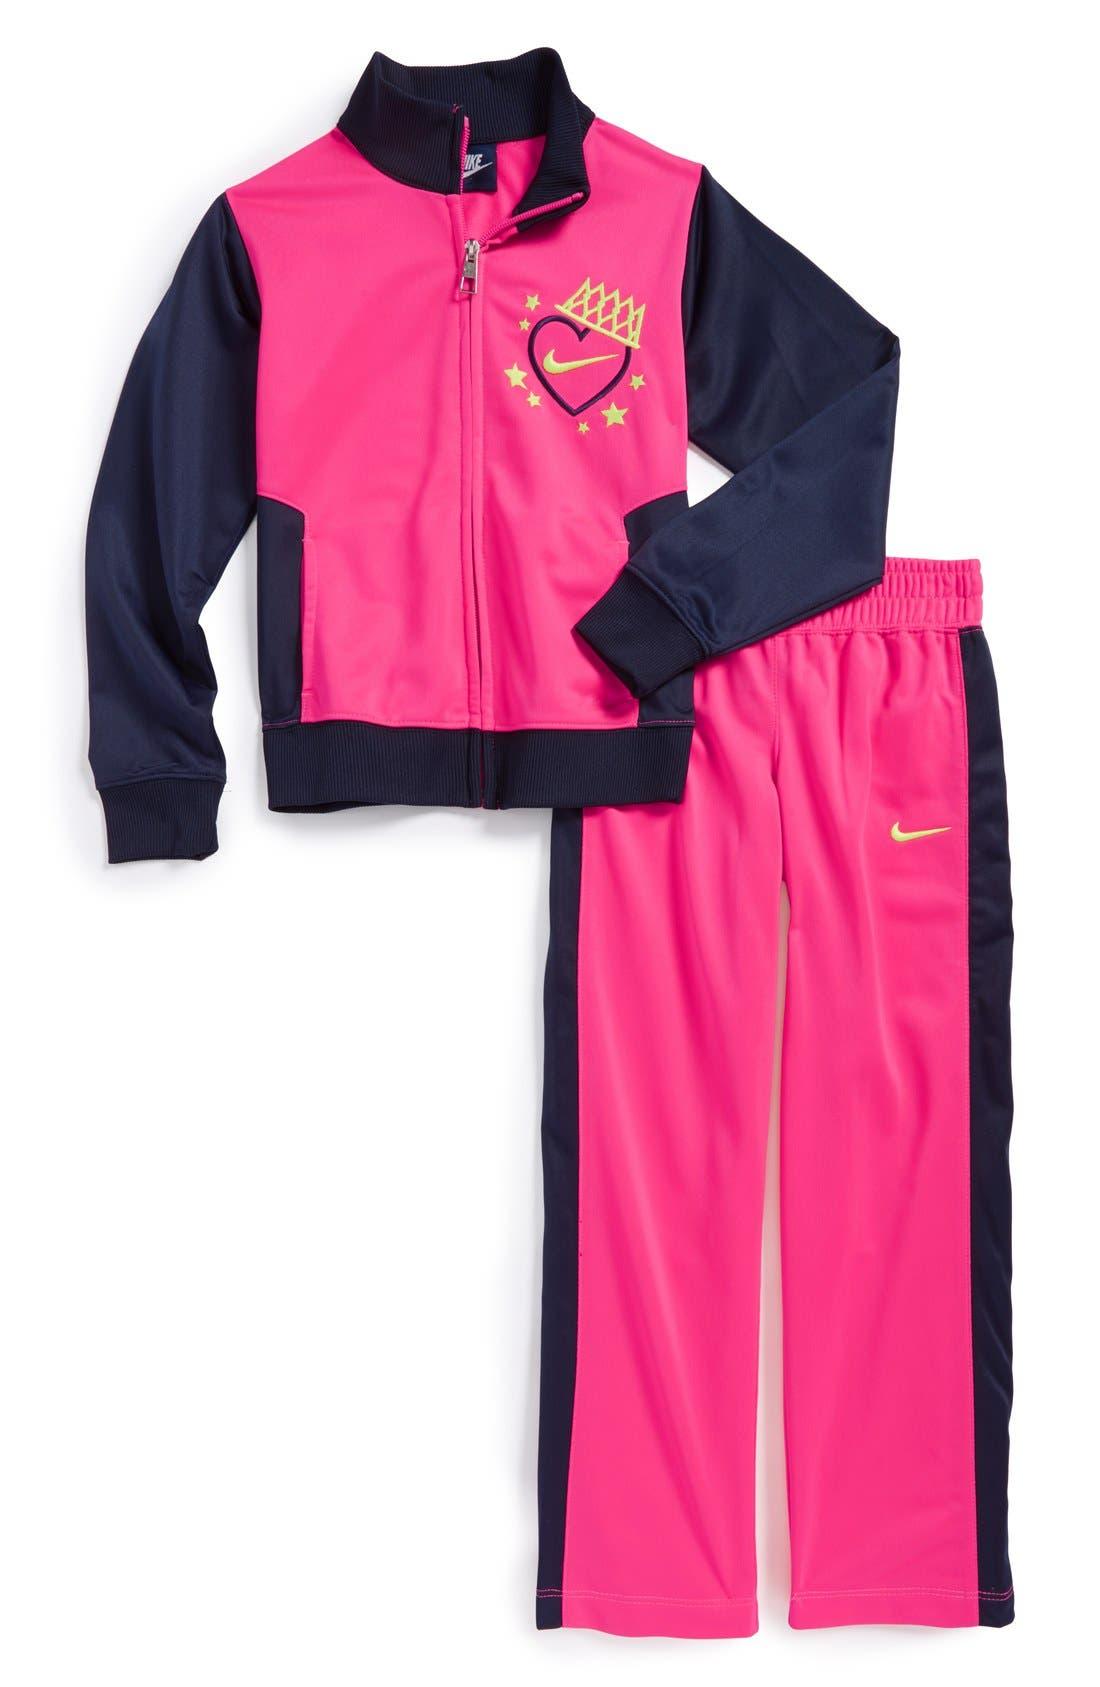 Alternate Image 1 Selected - Nike 'Tricot' Warm Up Set (Toddler Girls & Little Girls)